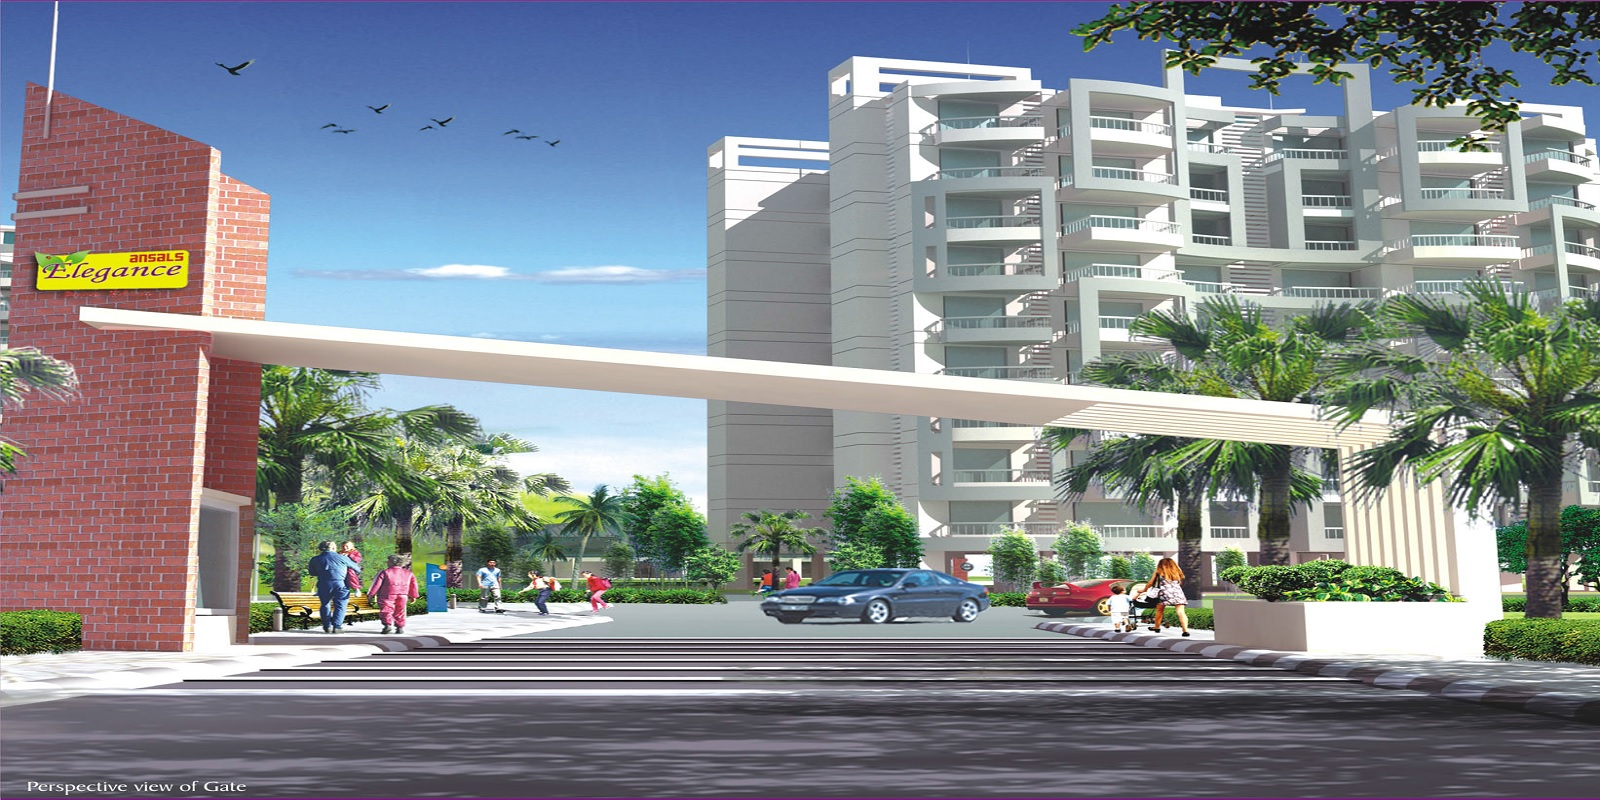 ansal housing elegance project entrance view1